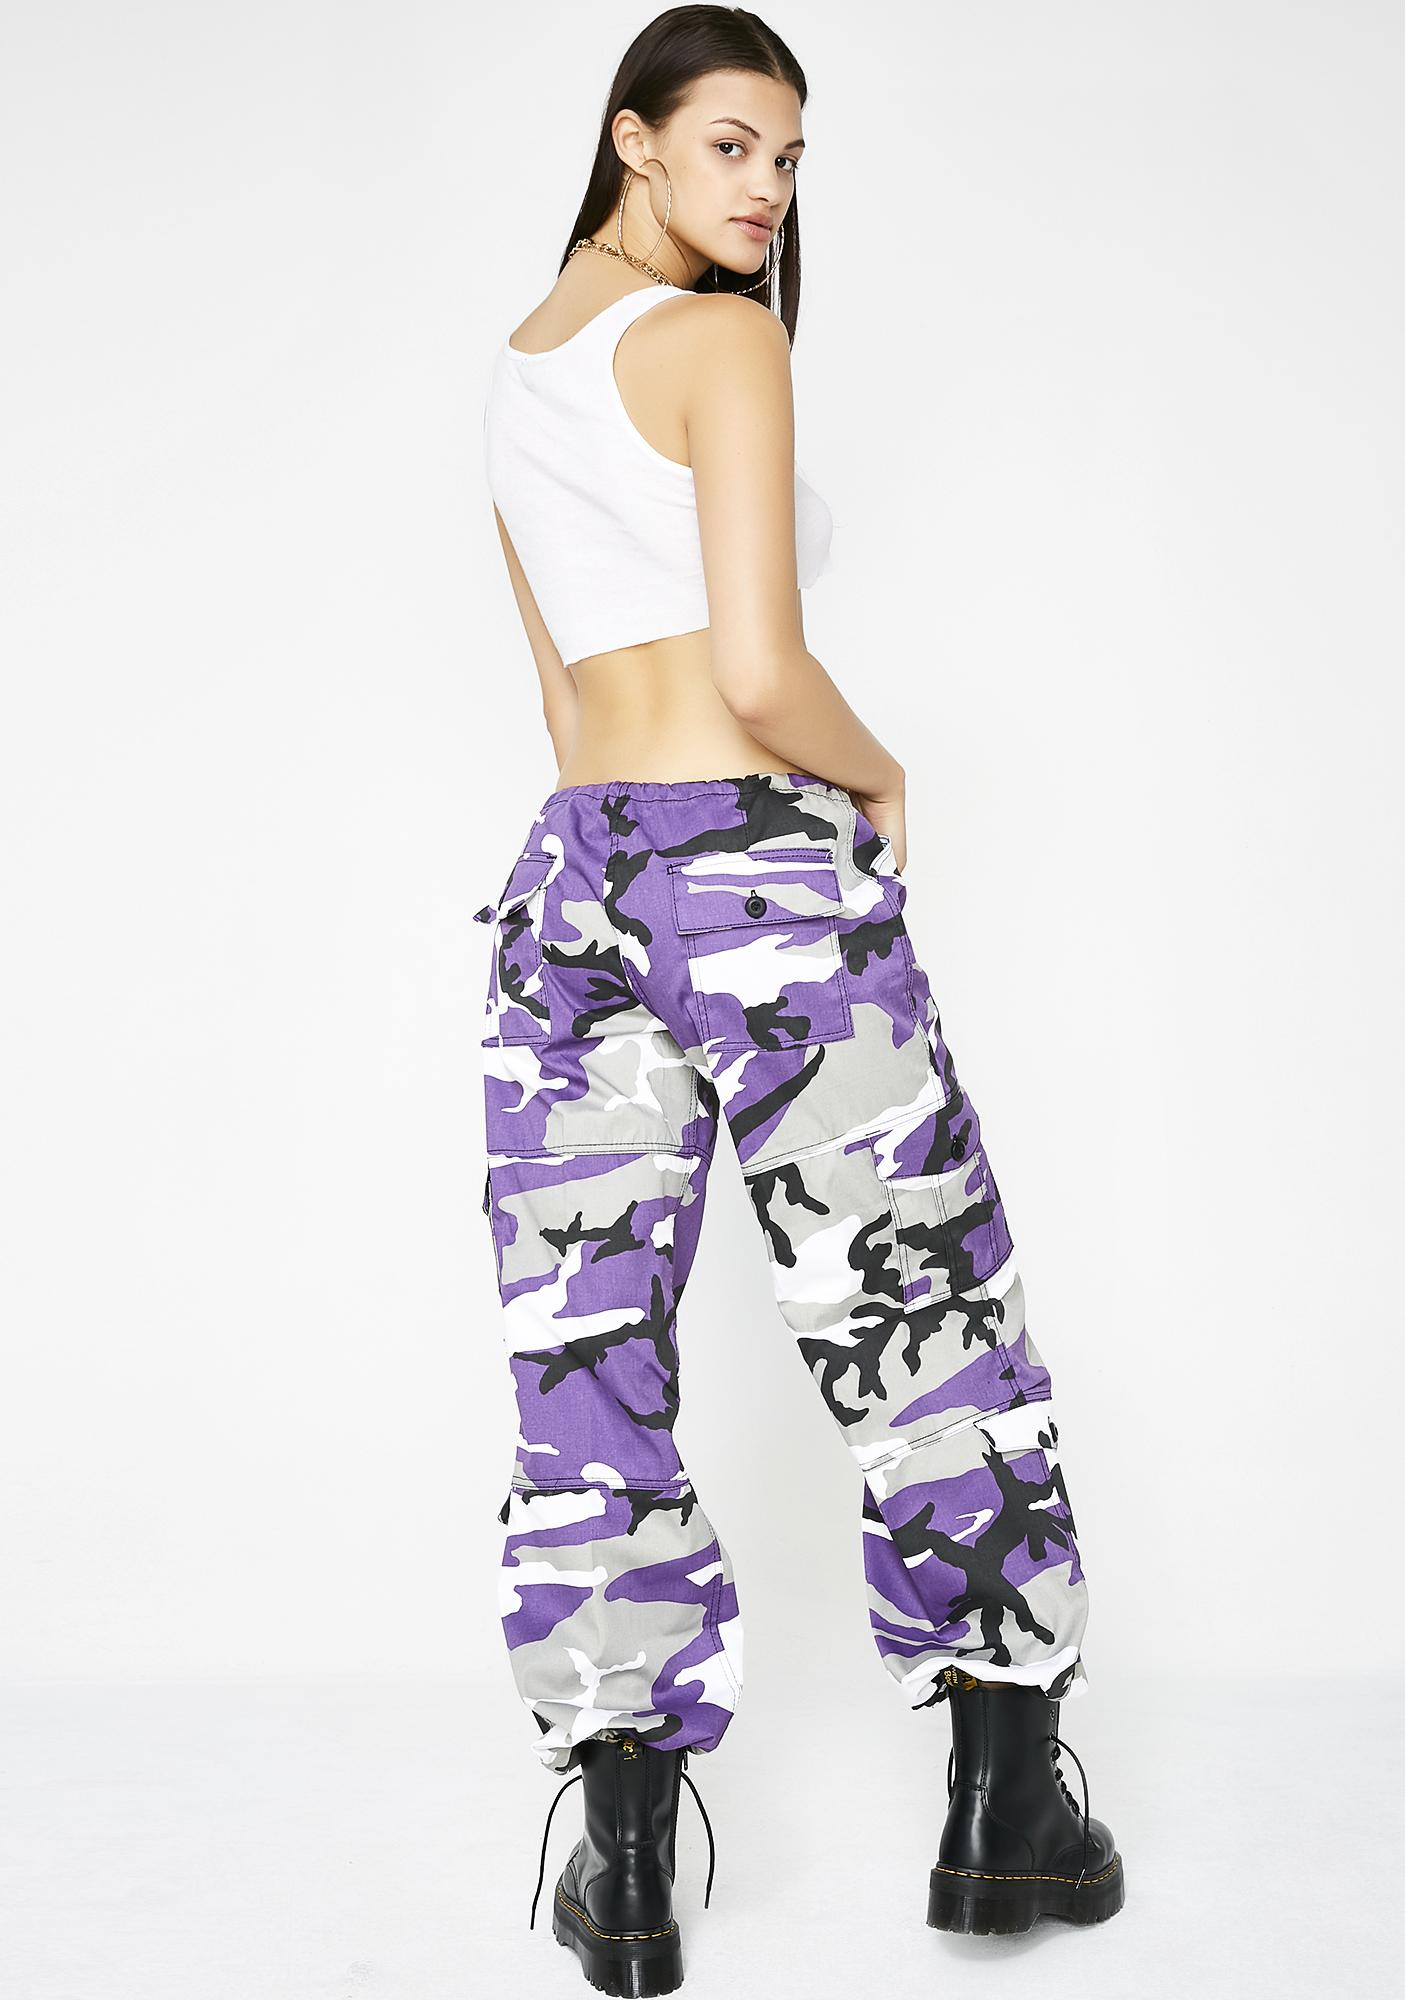 c9fb04420f6 ... Sizurp Army Brat Cargo Pants ...